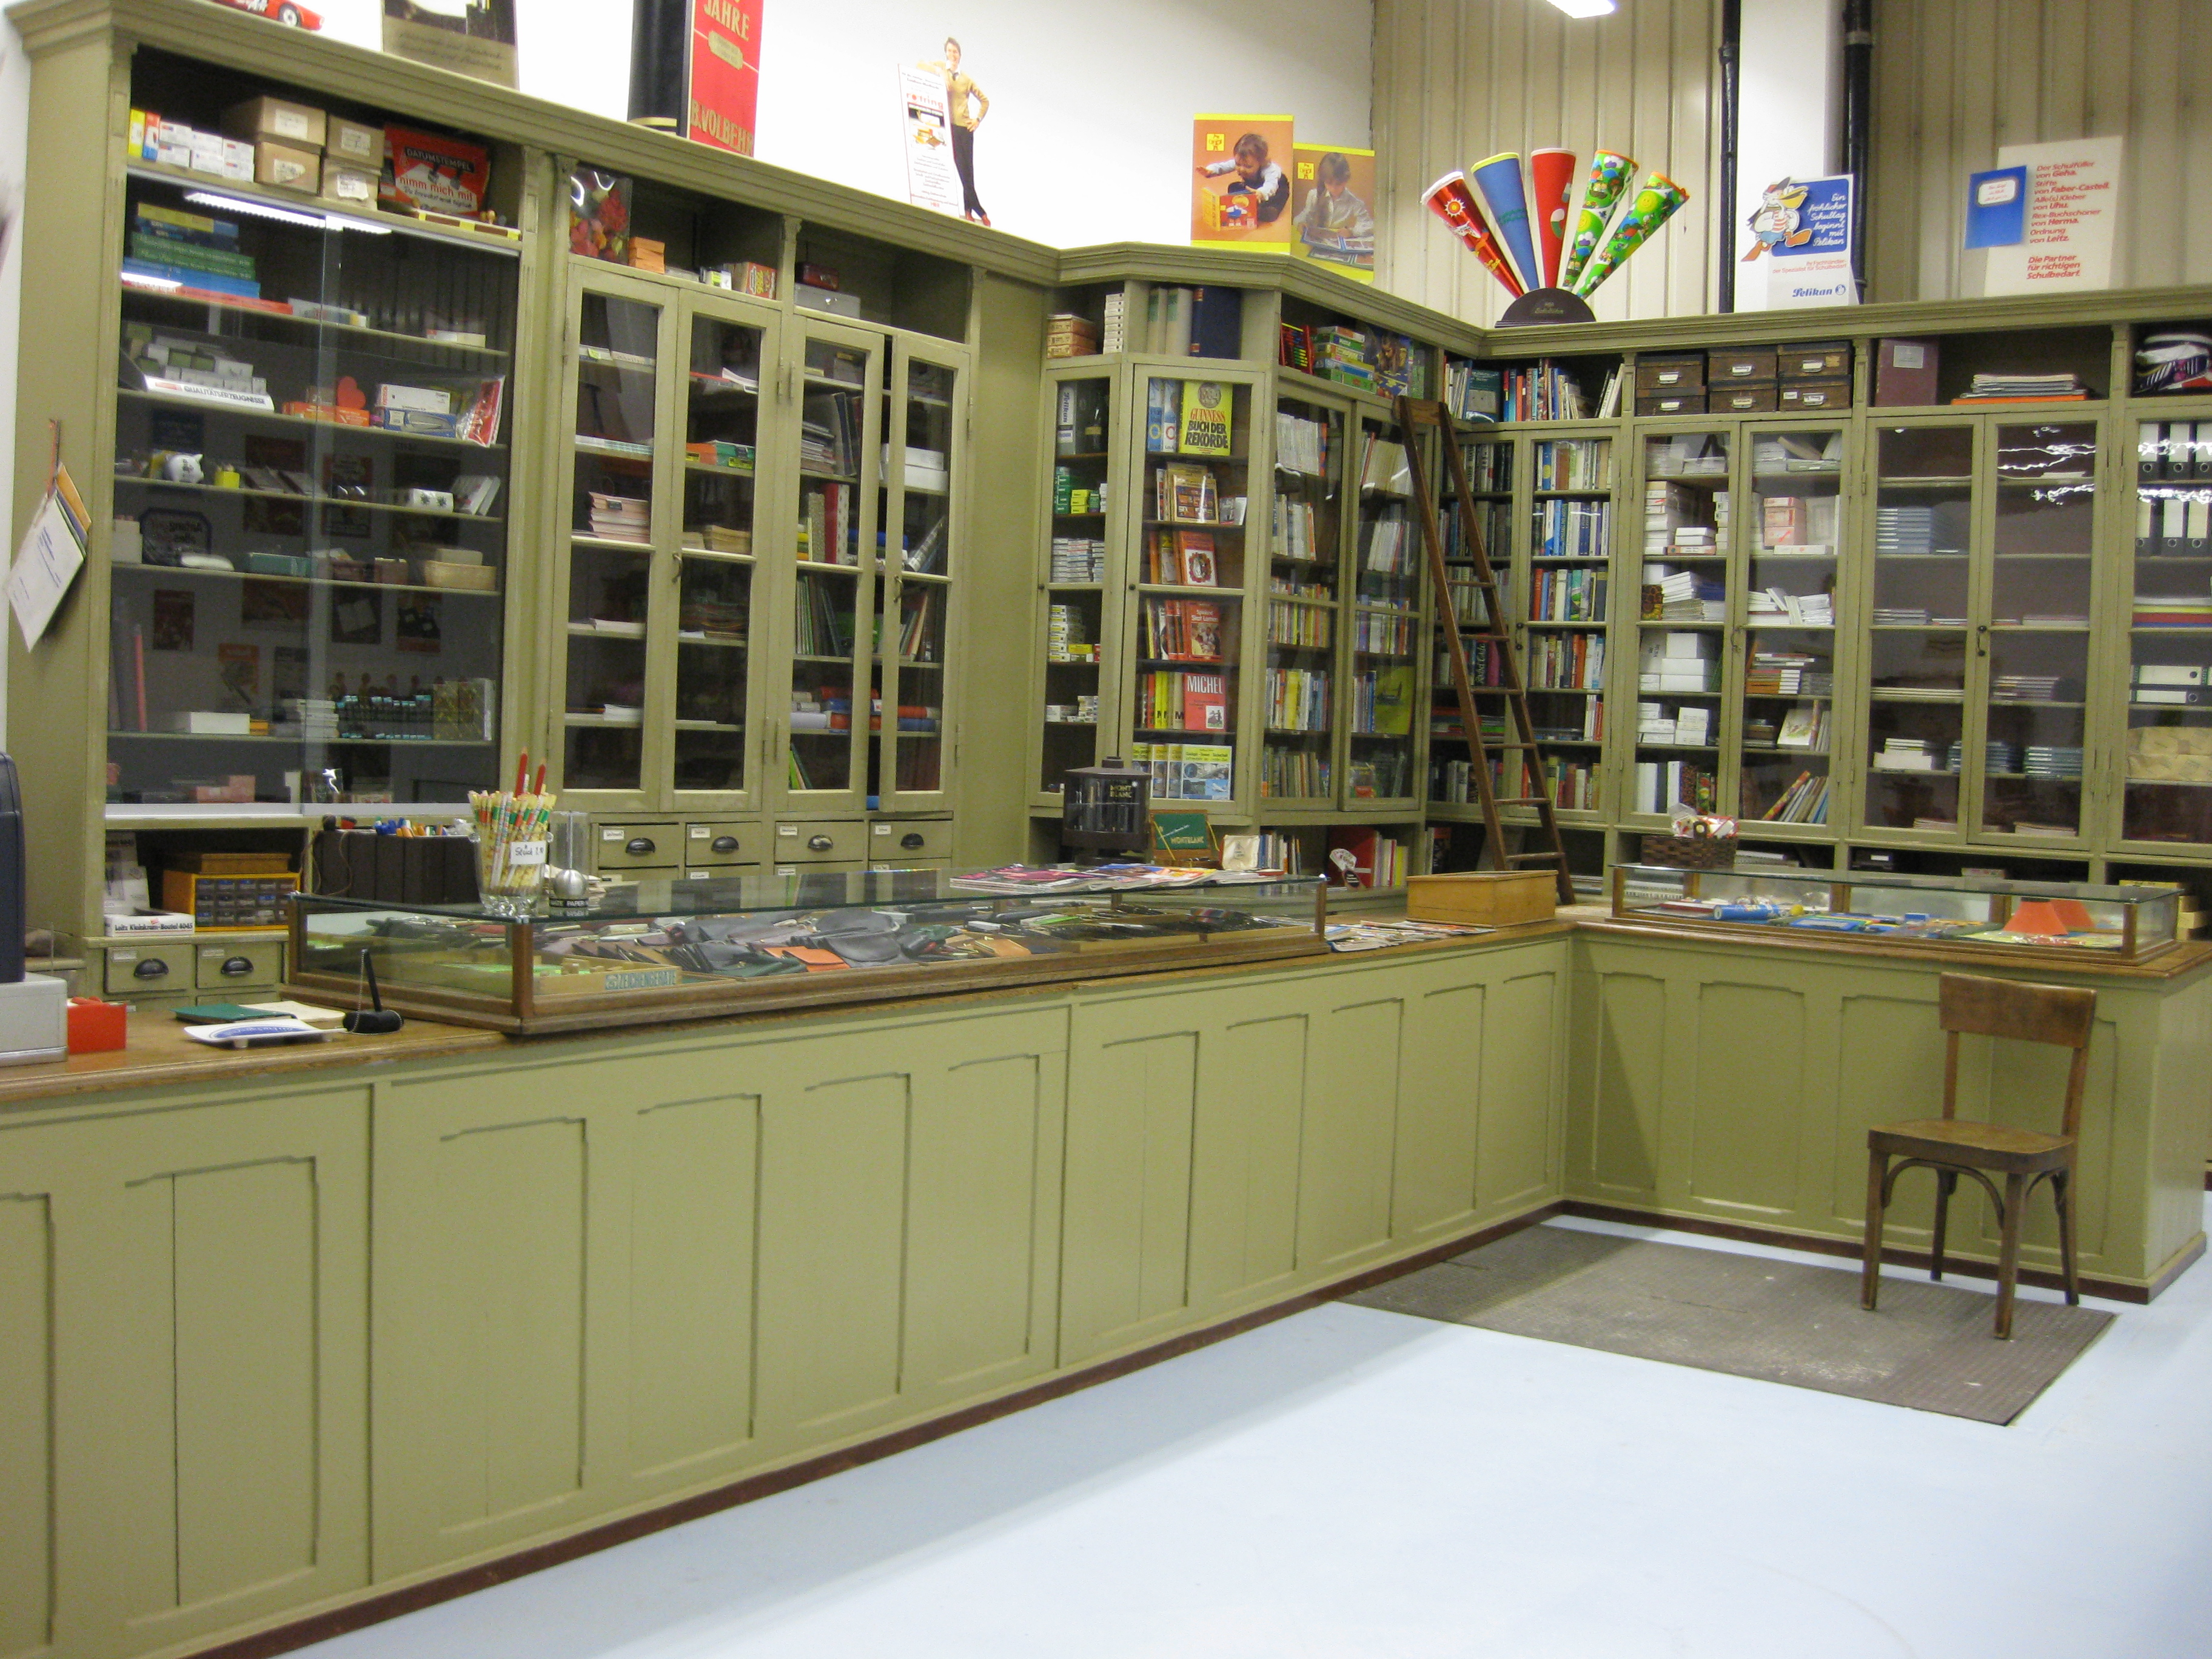 Dateikieler Stadtmuseum Depot Ladenjpg Wikipedia